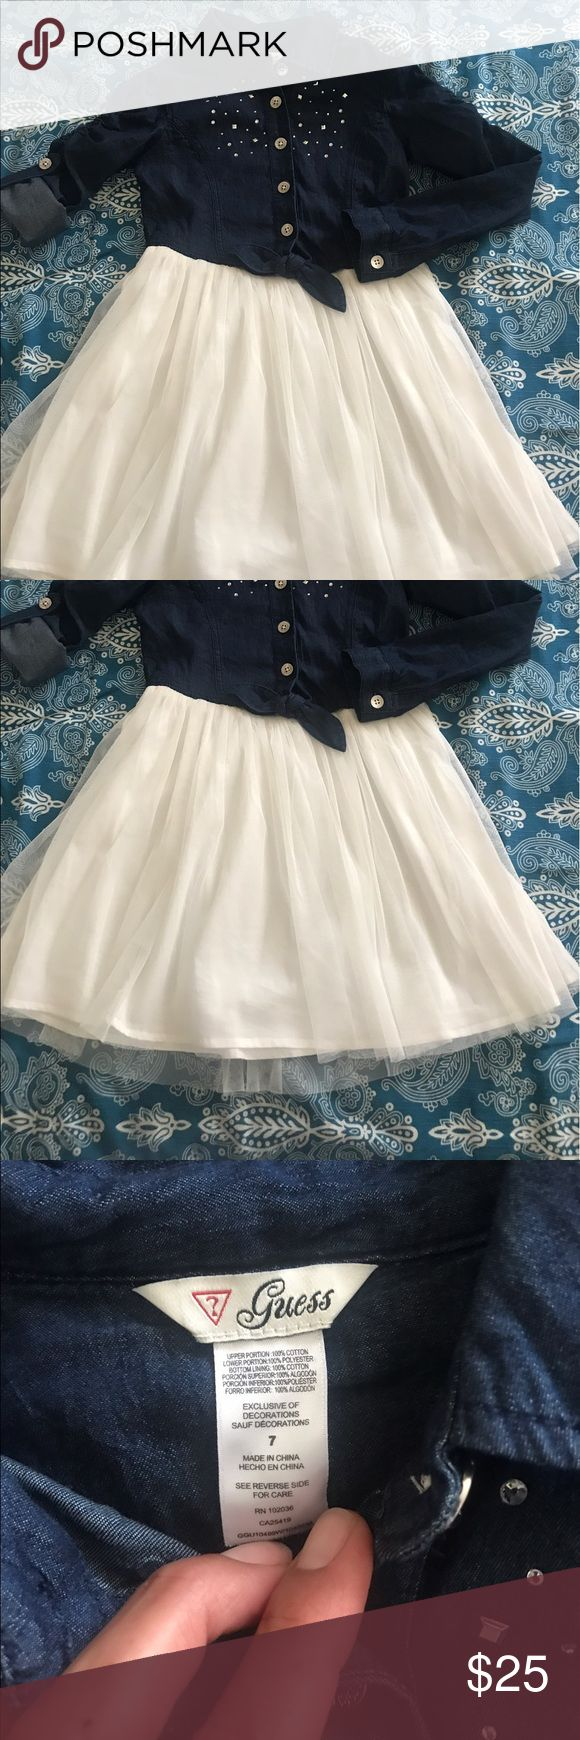 Guess Dress Guess Dress Jean upper, tutu-ish bottom, NWOT Size 7 Guess Dresses